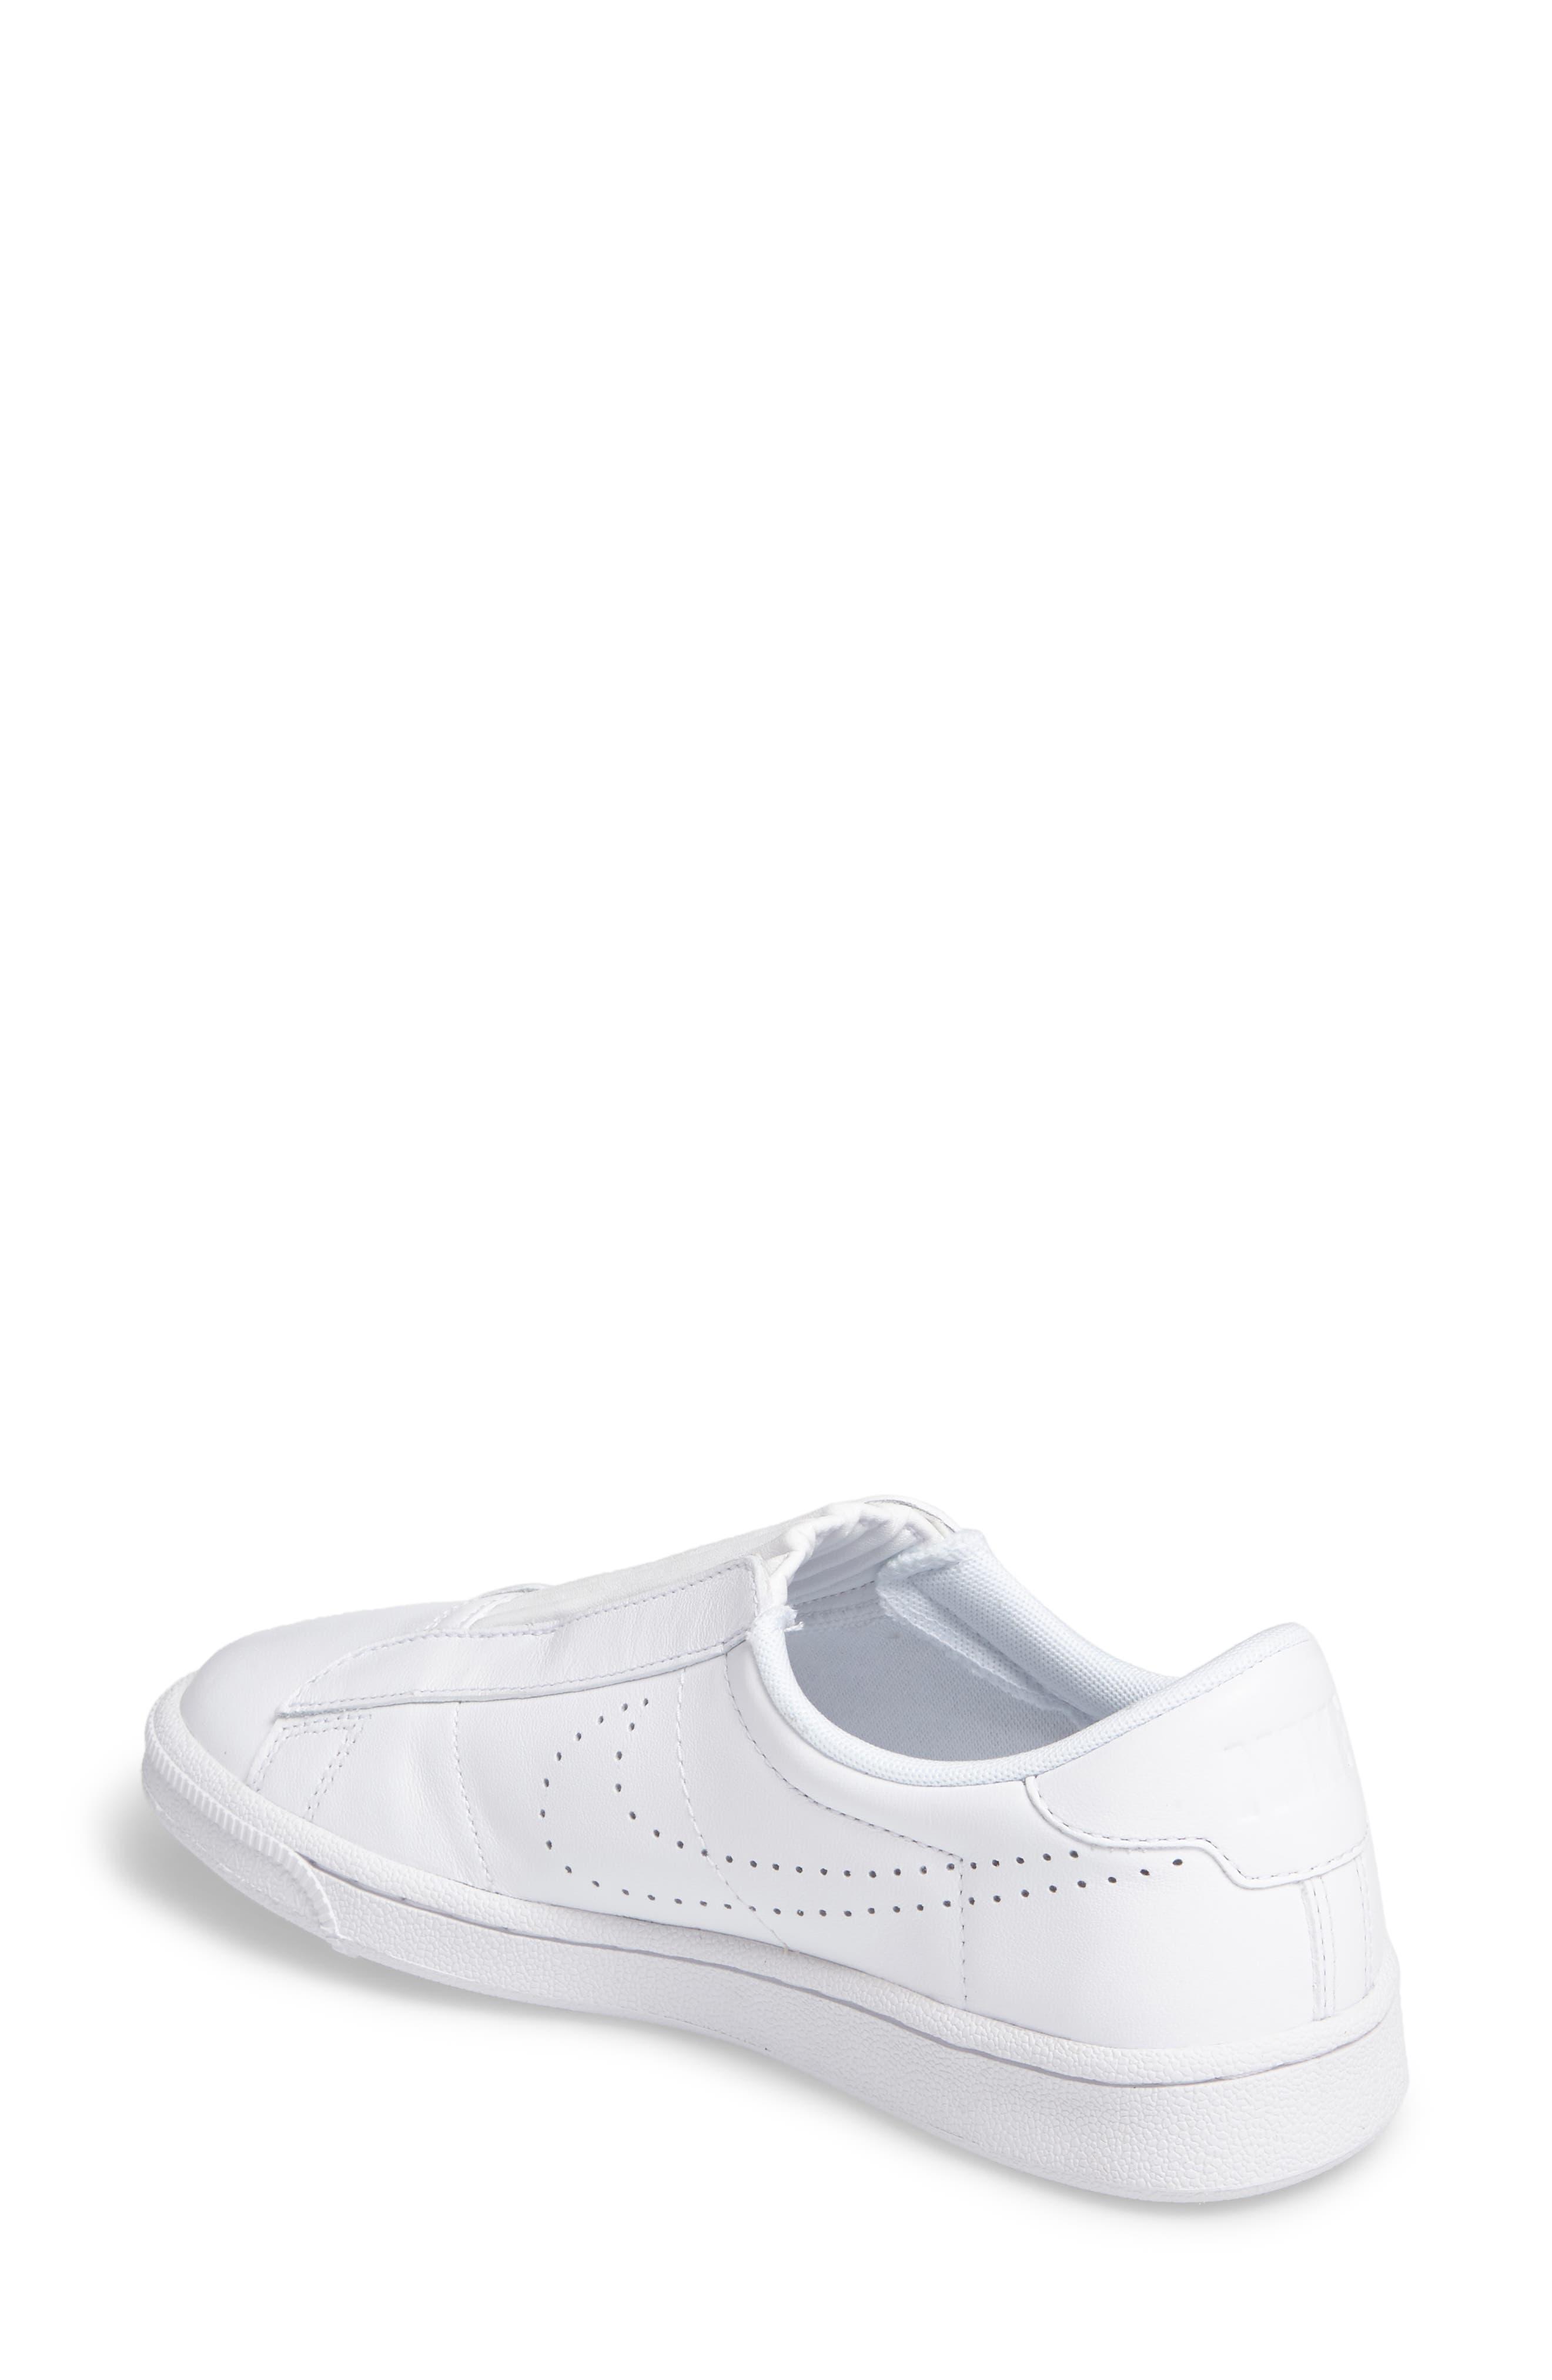 Classic EZ Slip-On Tennis Shoe,                             Alternate thumbnail 2, color,                             White/ White/ Black